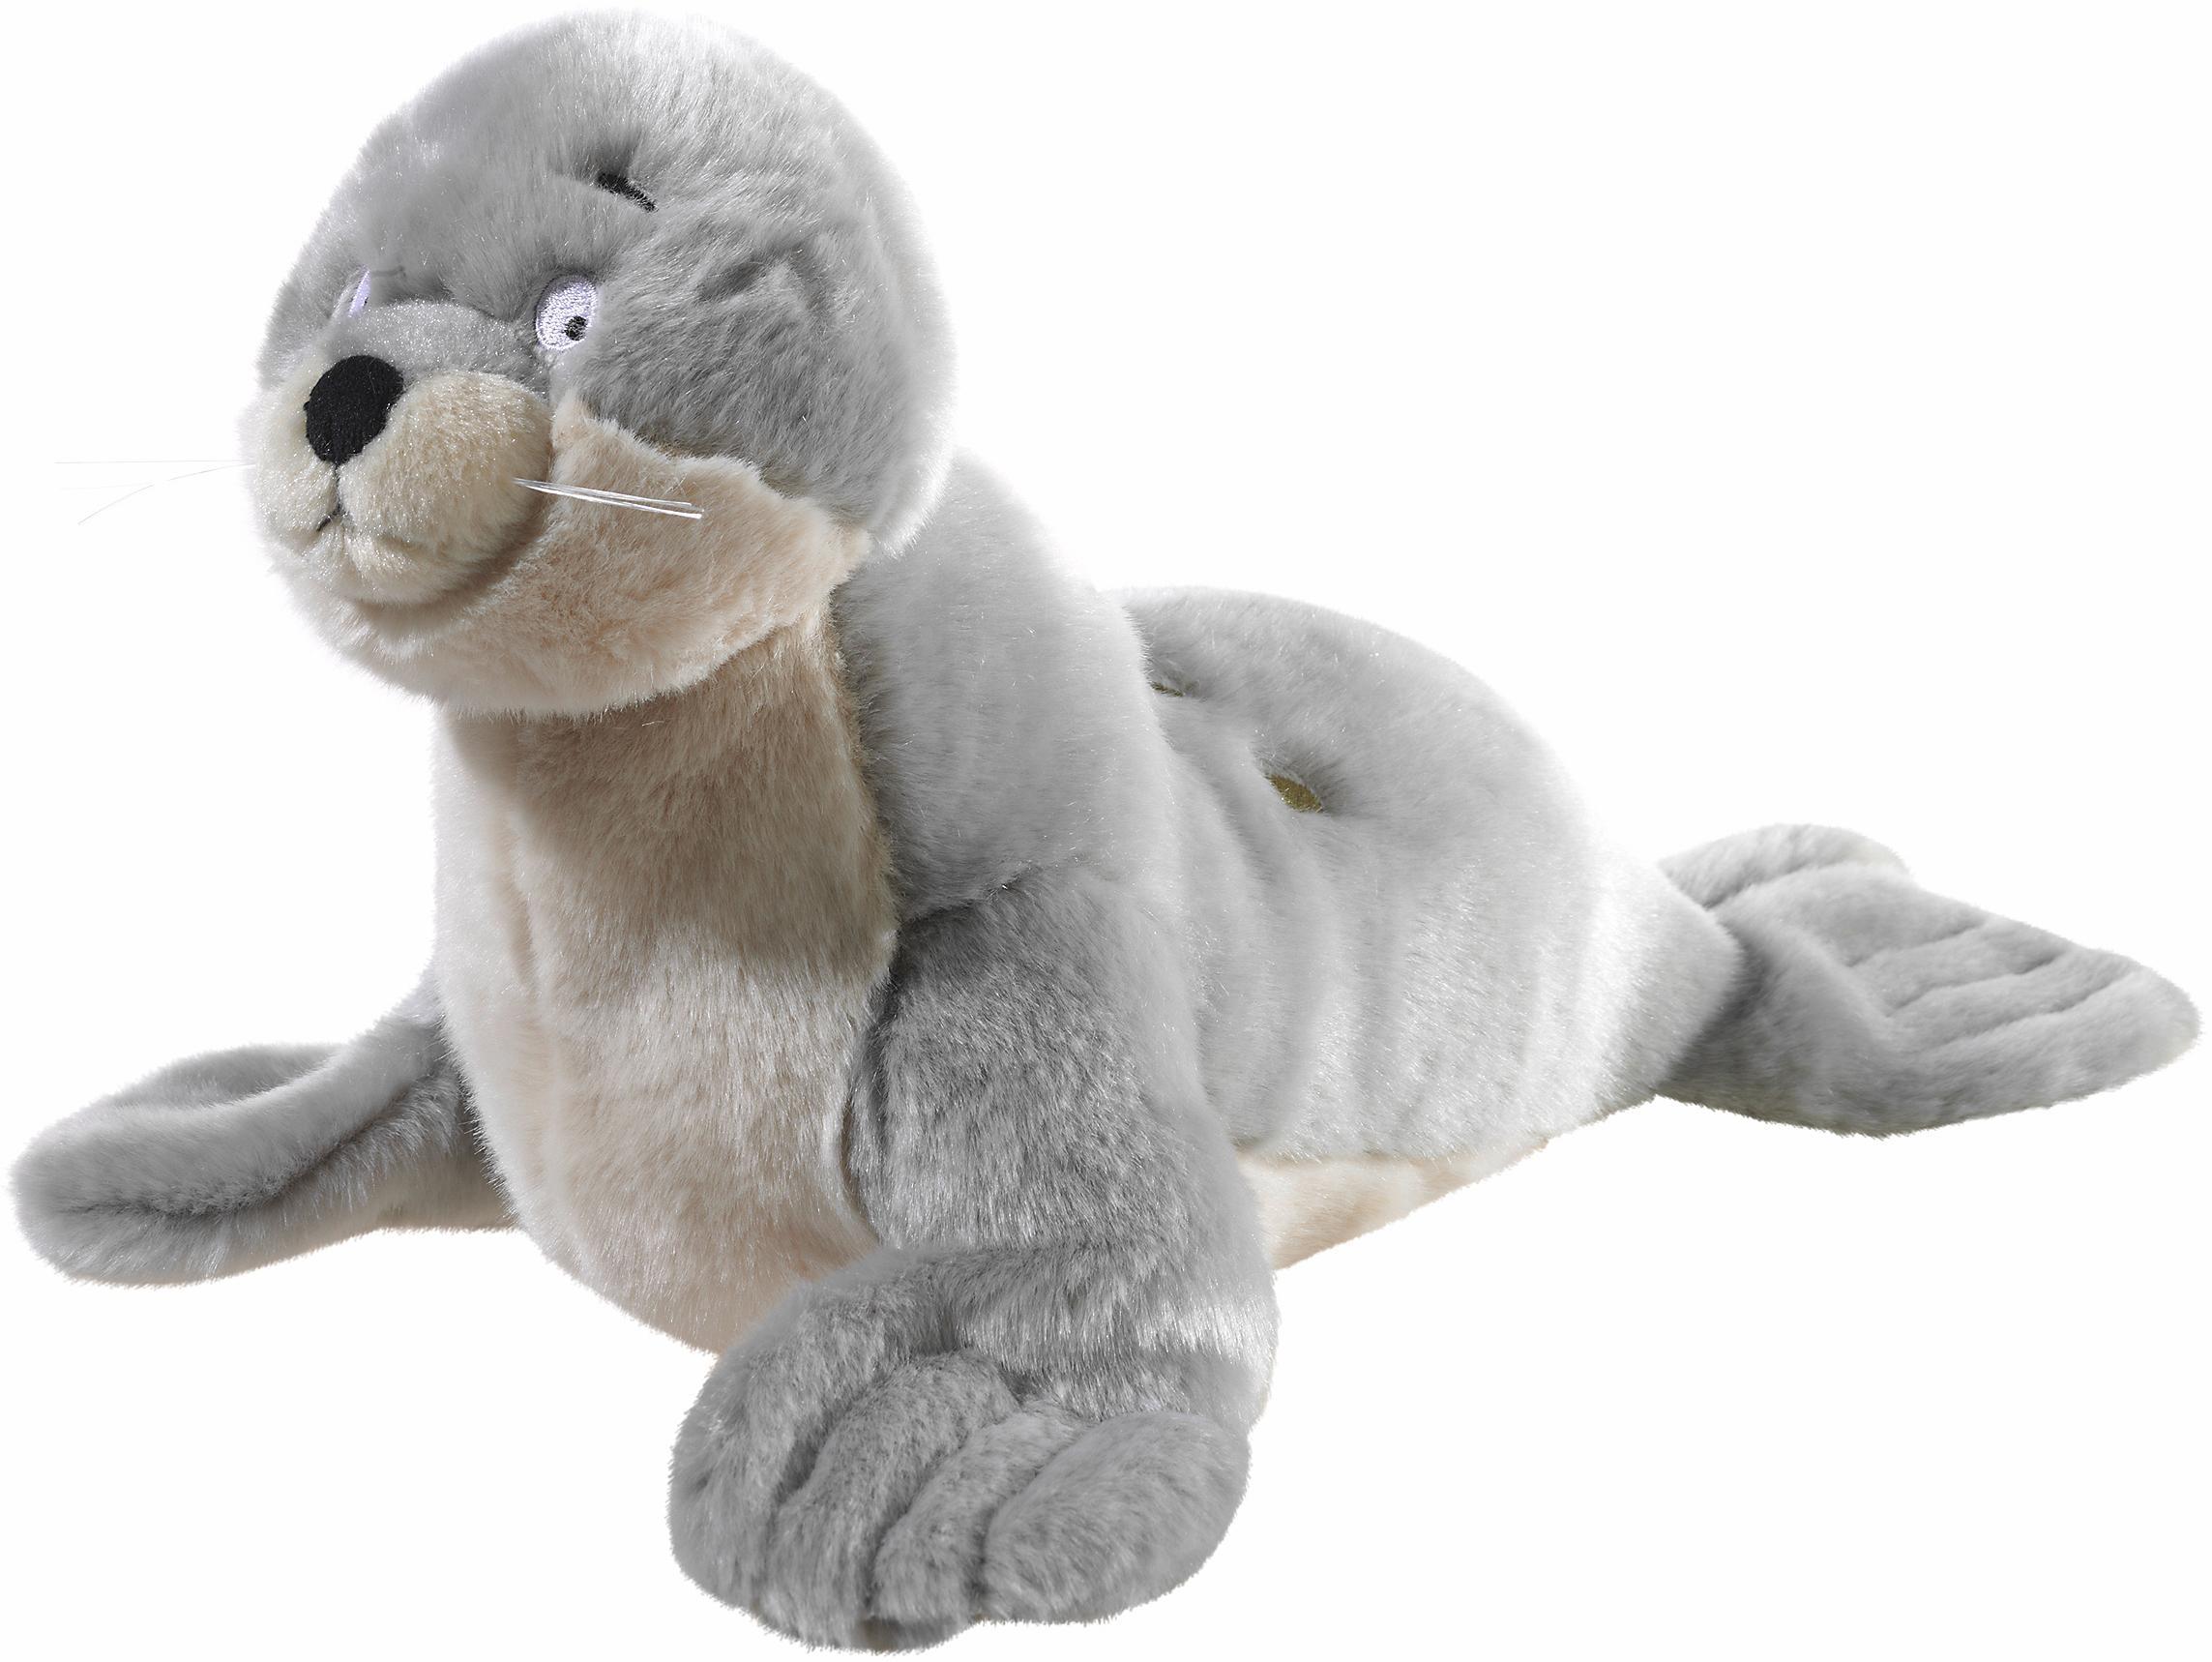 Heunec Plüschtier Robbe, »Kleiner Eisbär, Robby, 25 cm« | Bekleidung > Bademode > Bademäntel | Mehrfarbig | Ab | HEUNEC